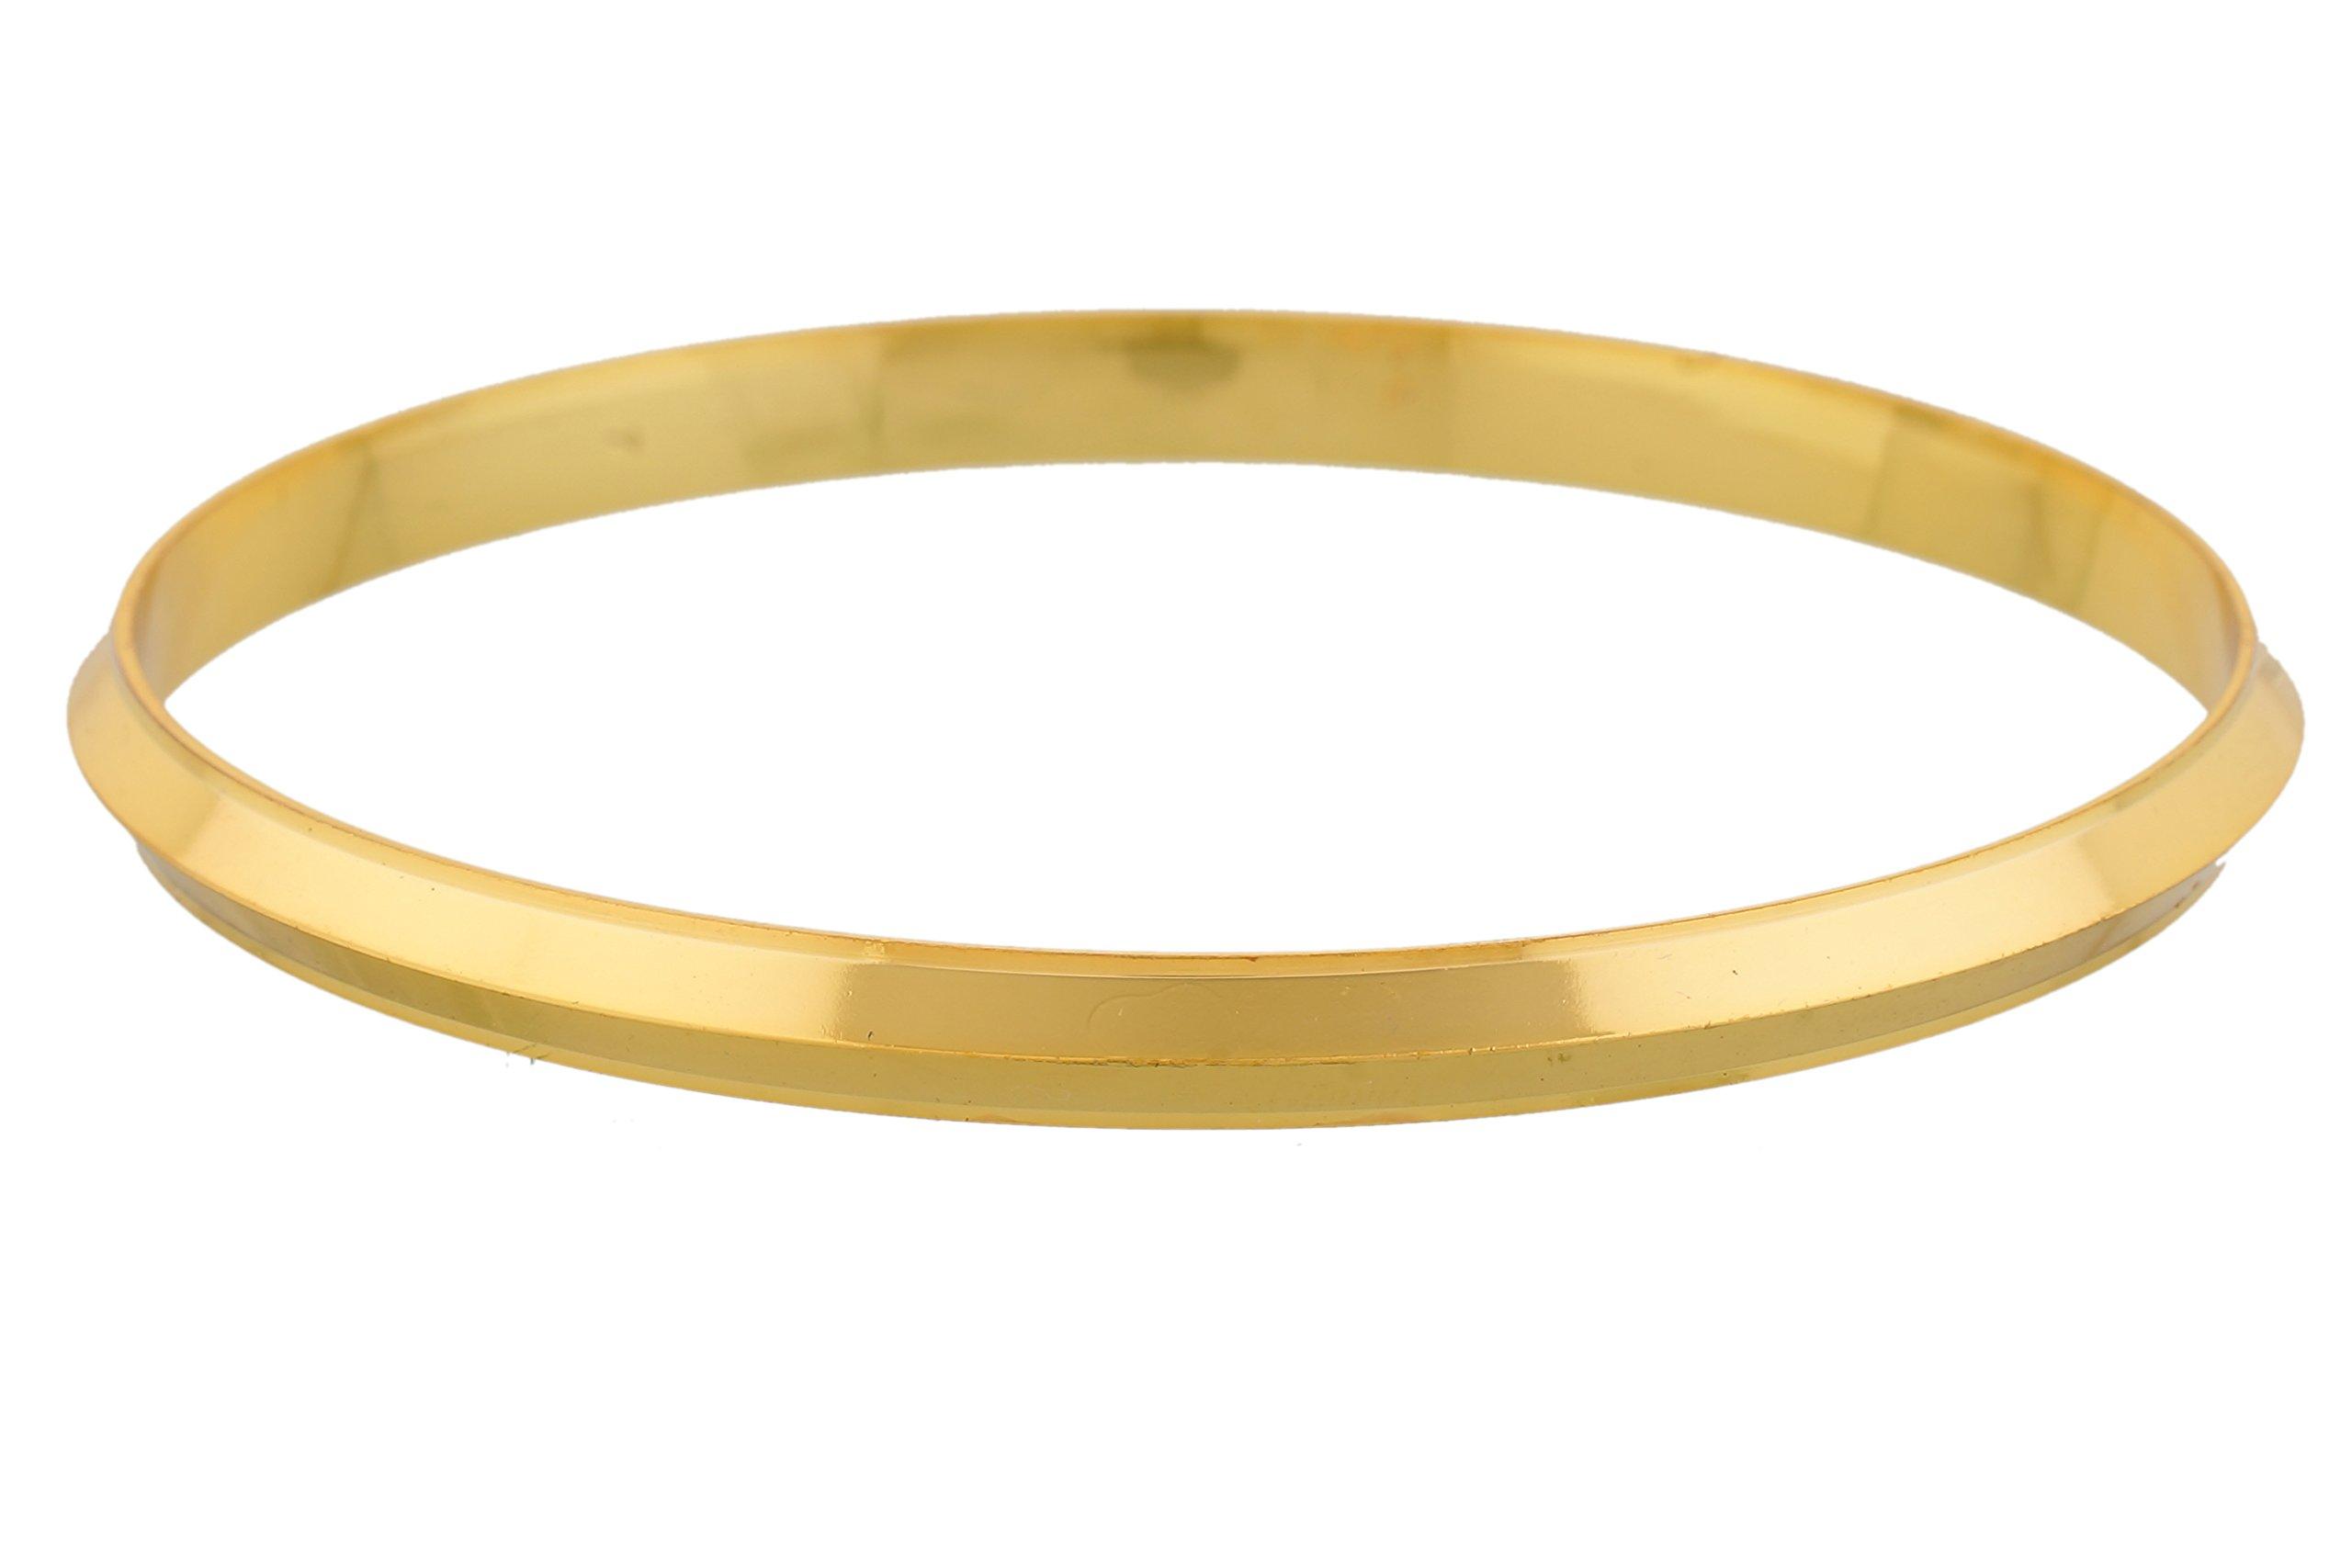 Jewbang Gold Plated Imitation Shining Bracelet Kada for Men-JB439DEAL12 product image